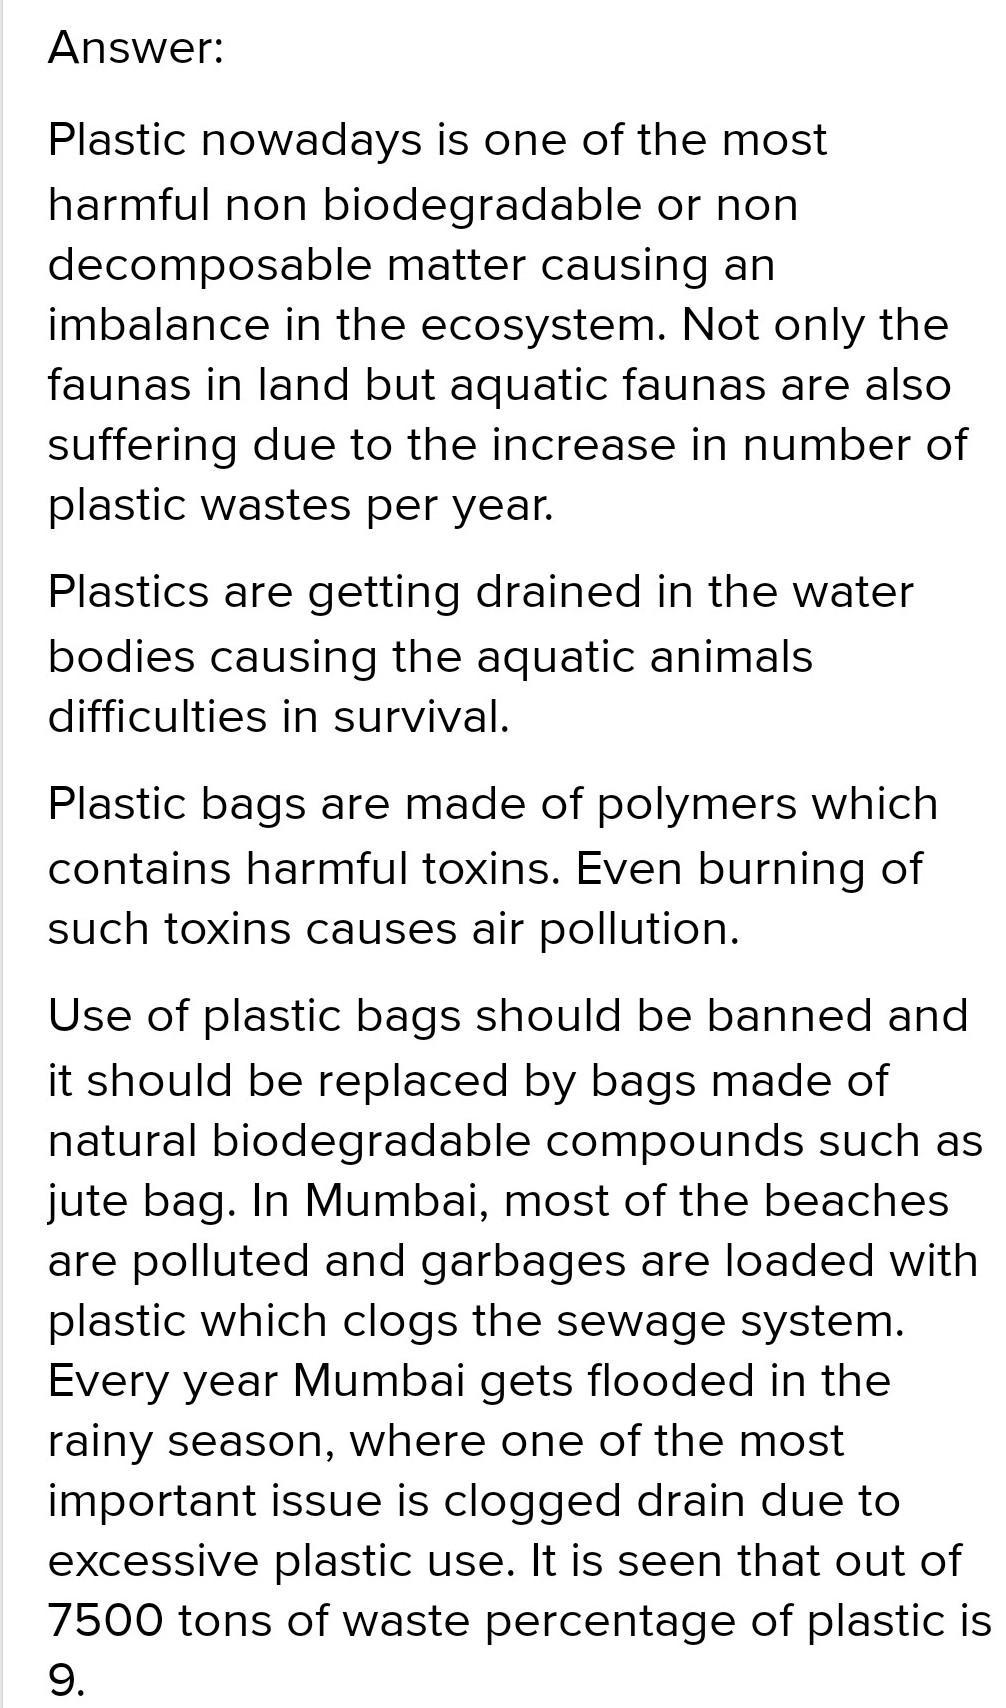 Free essay on plastic pollution interactive presentation tools